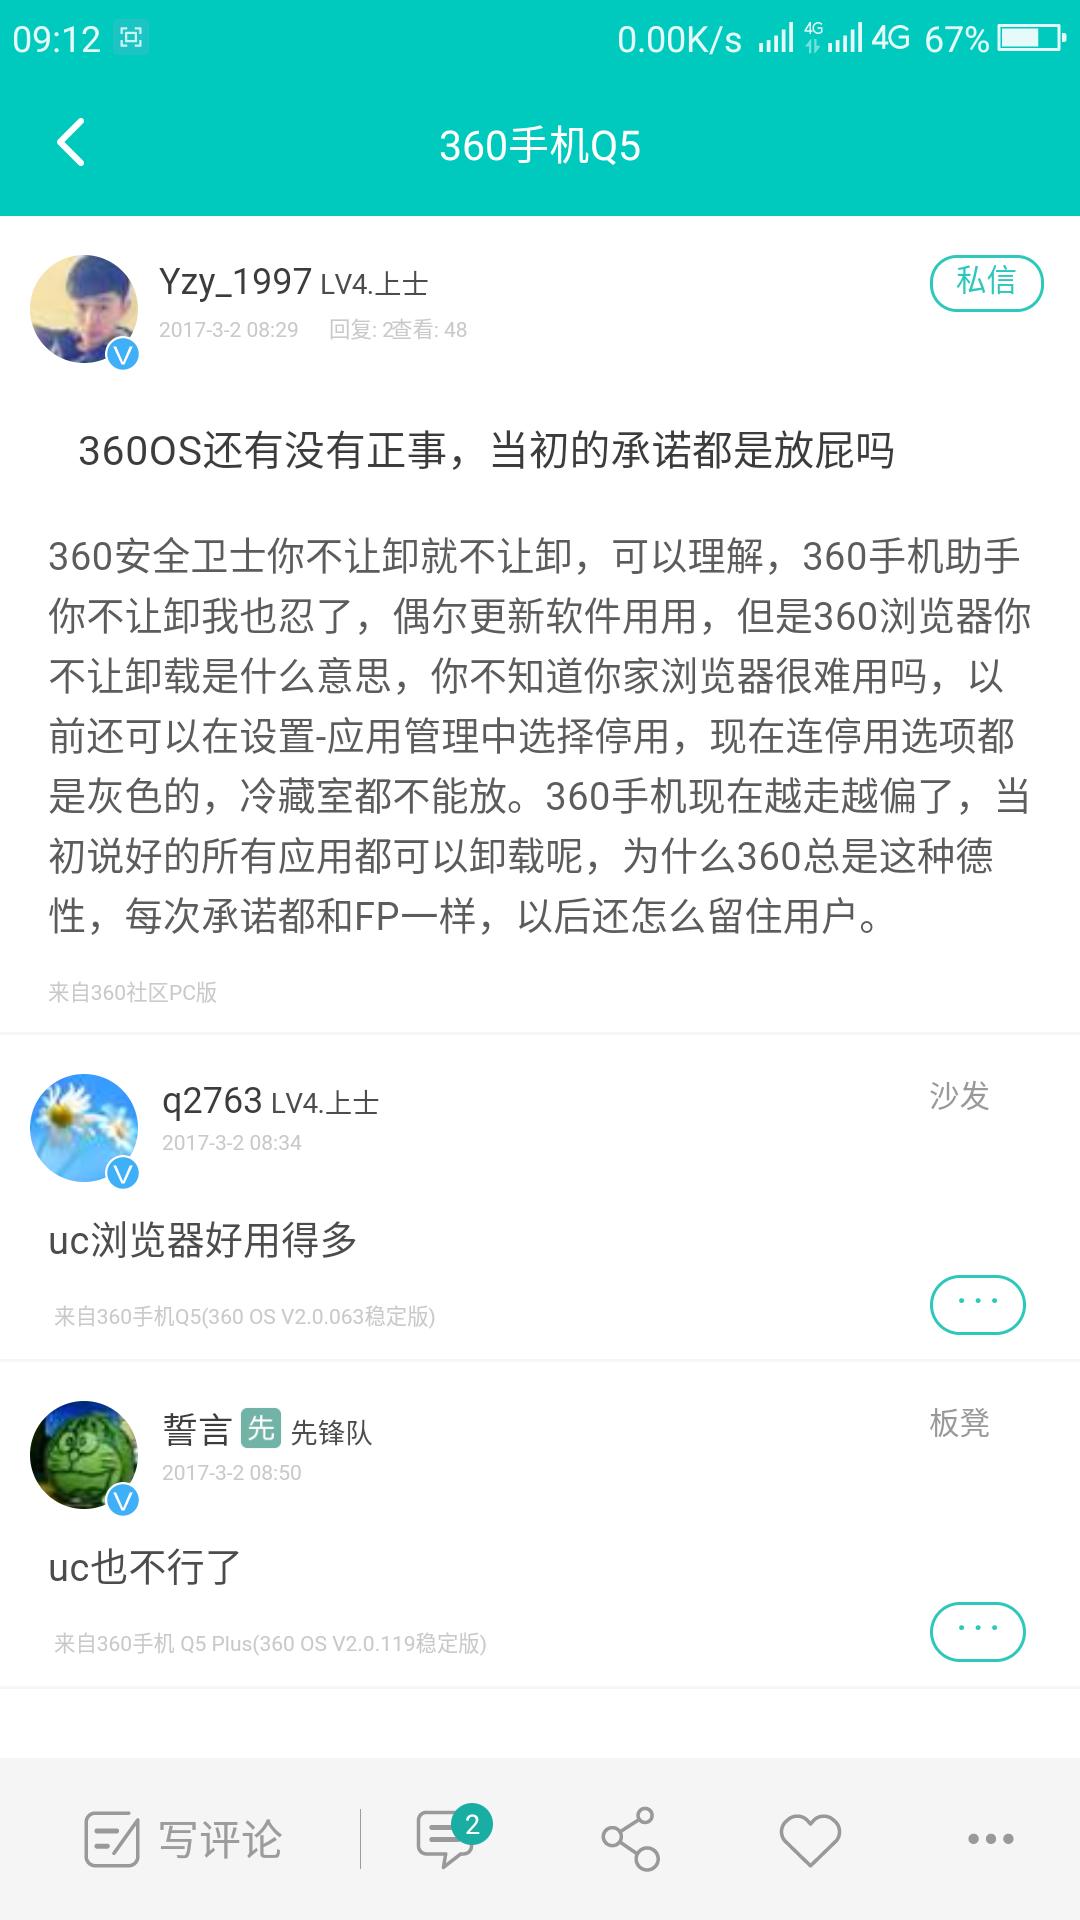 Screenshot_2017-03-02-09-12-50.png